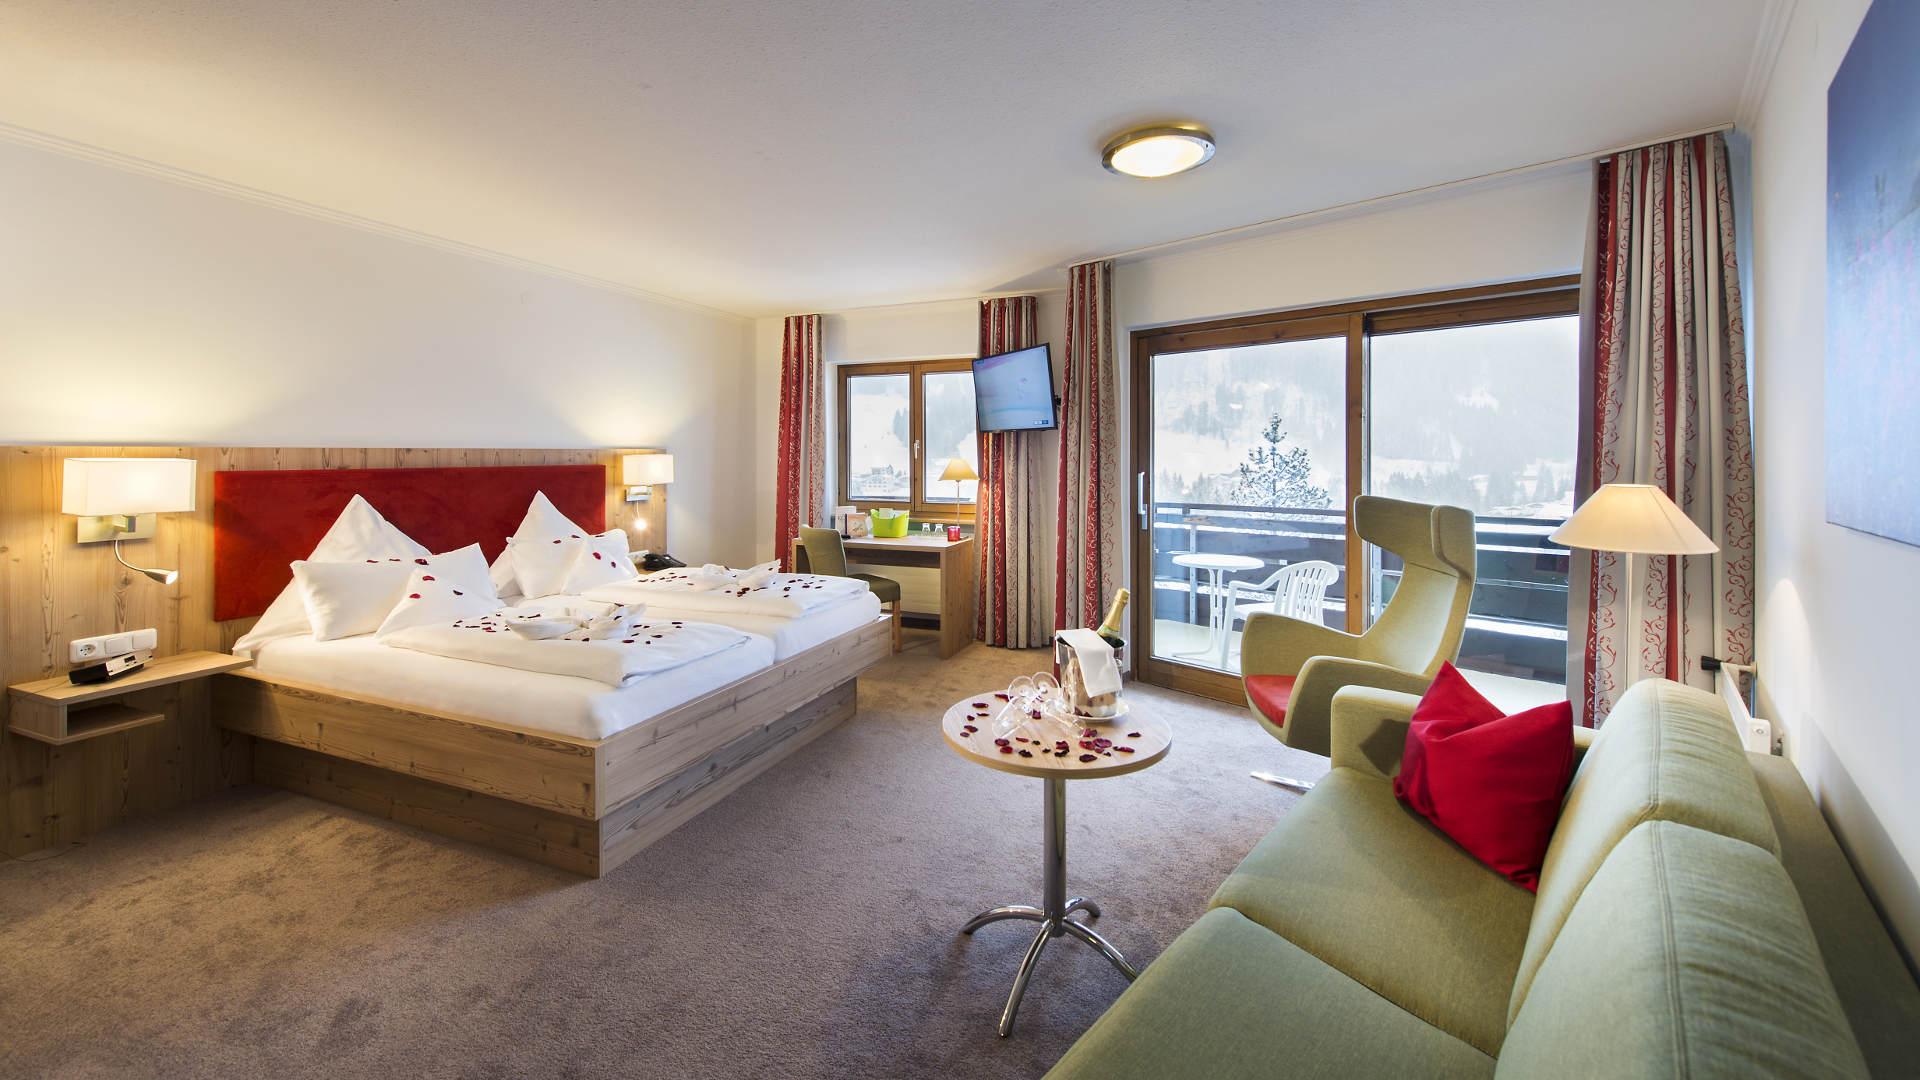 Doppelzimmer Romantik Hotel Erlebach Riezlern HB